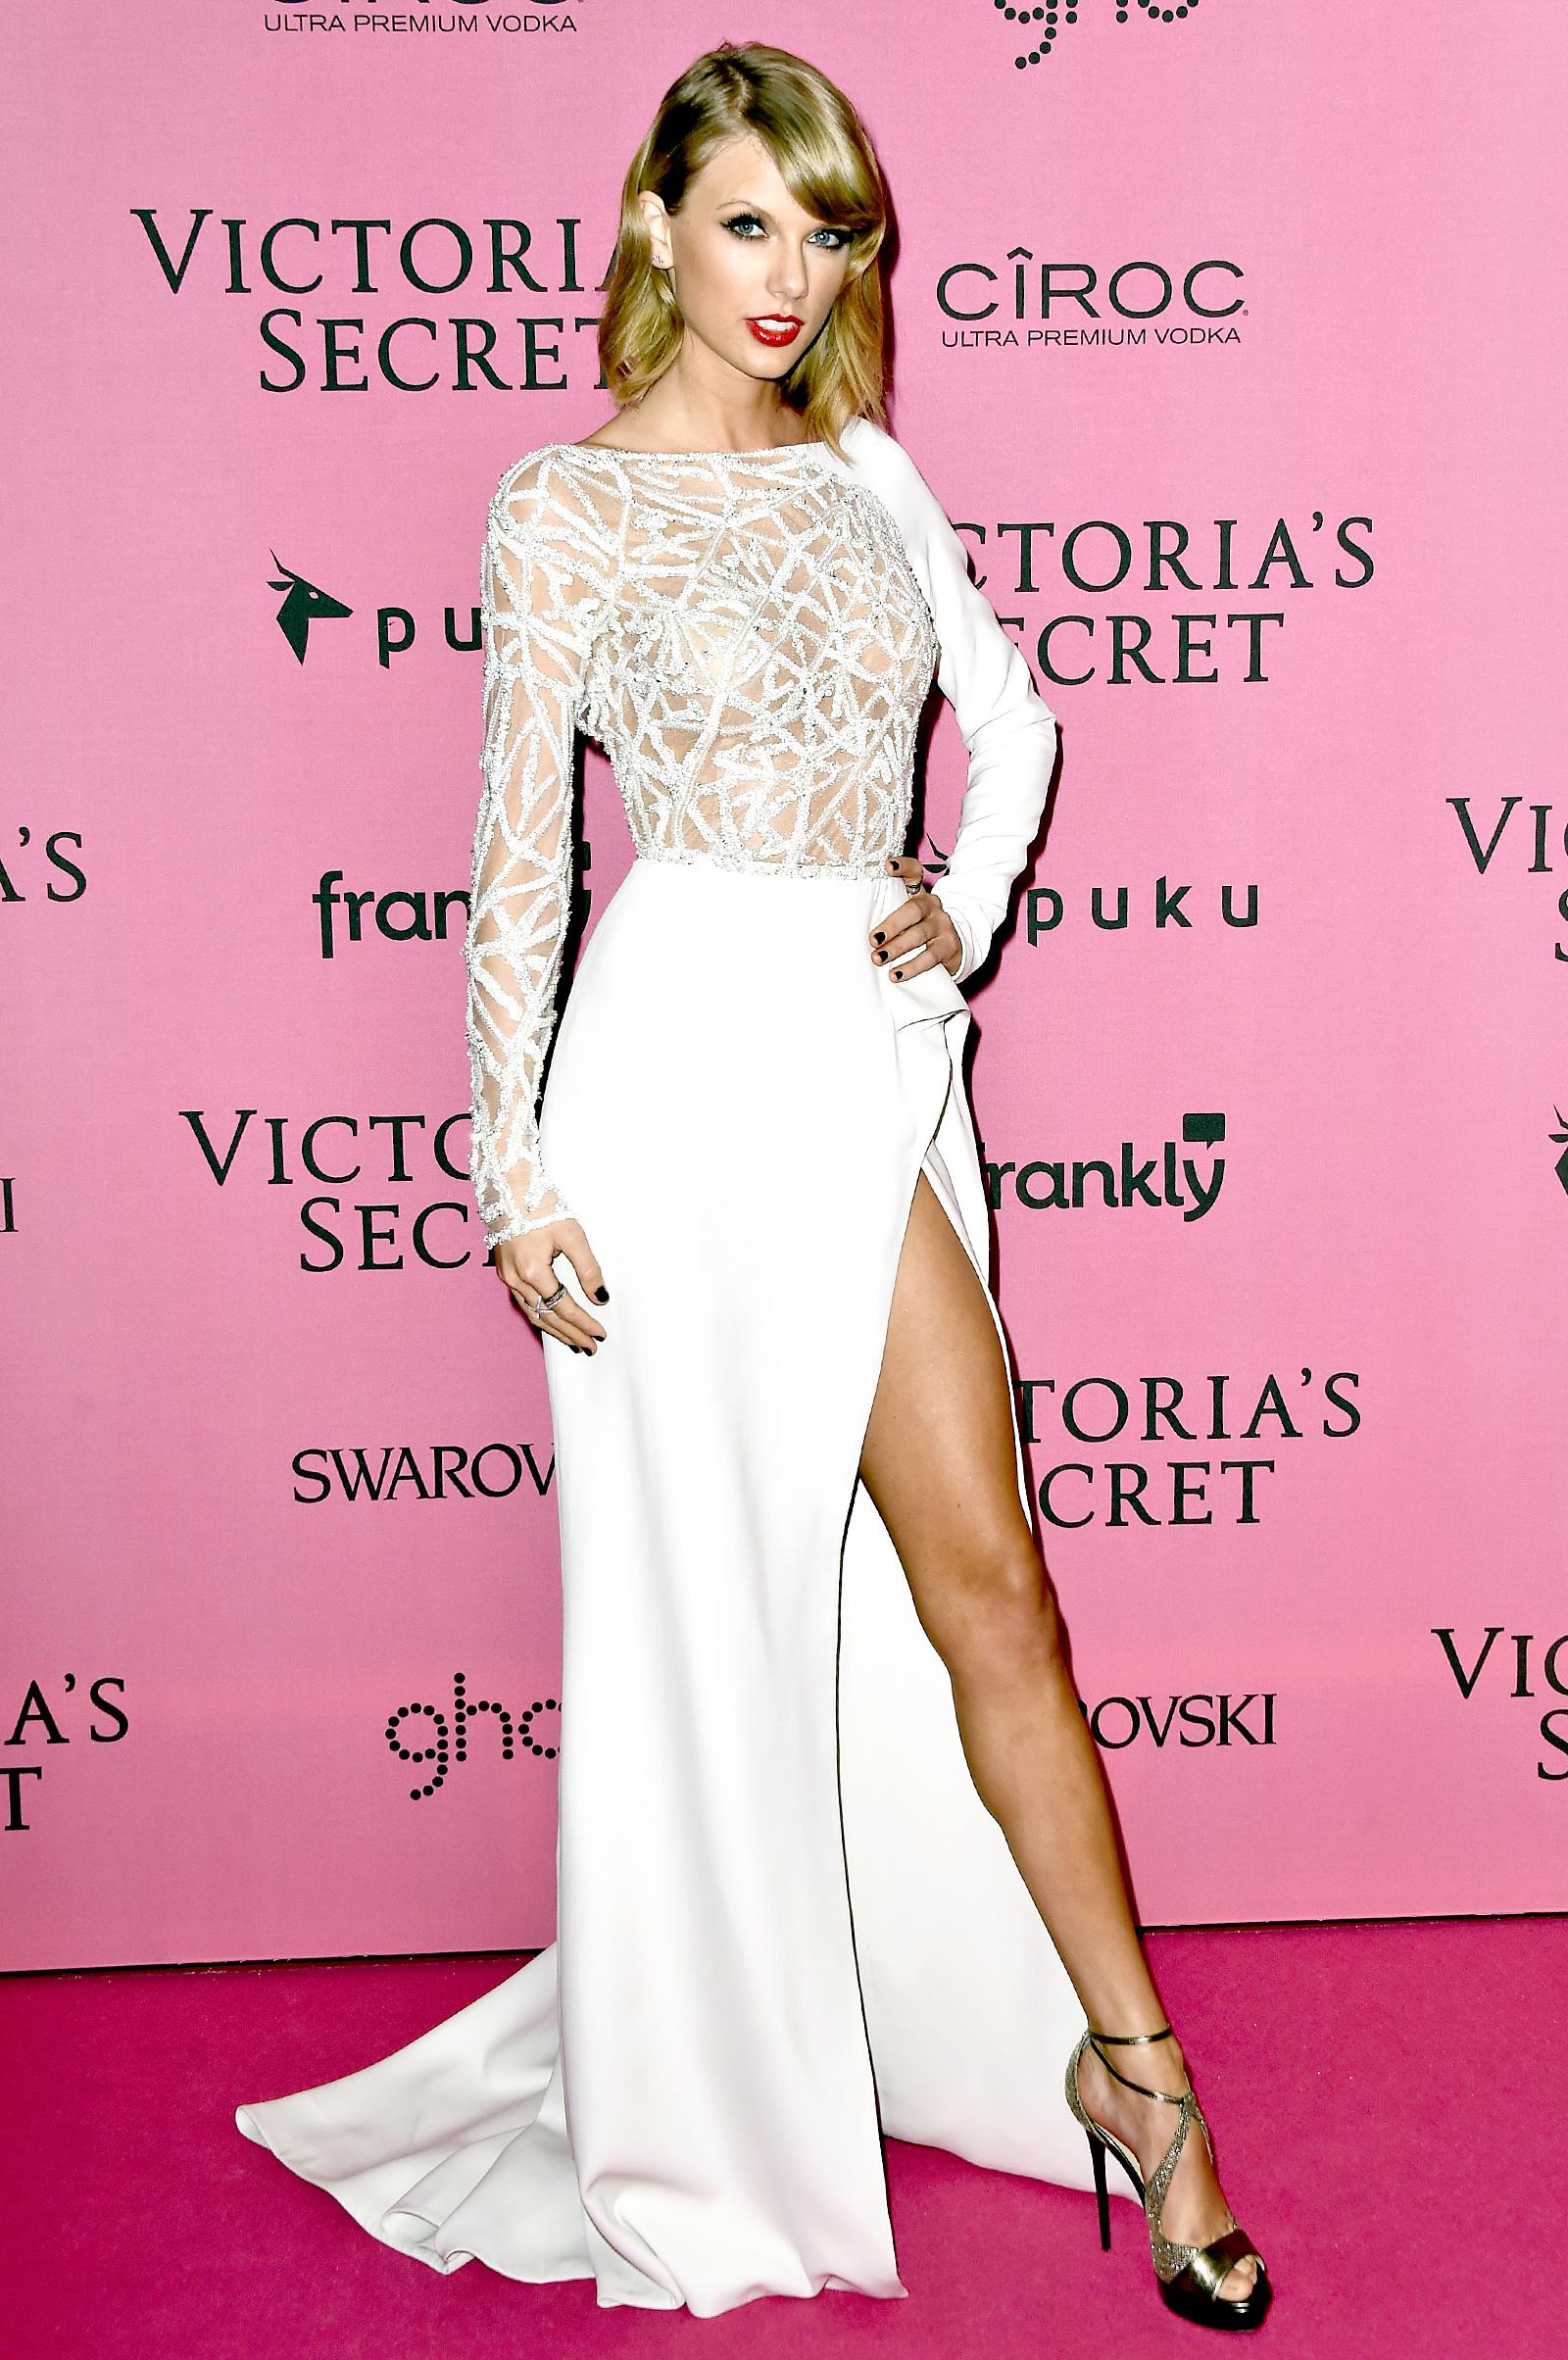 A Beautiful Gallery Of Taylor Swift 39 S 40 Million Legs